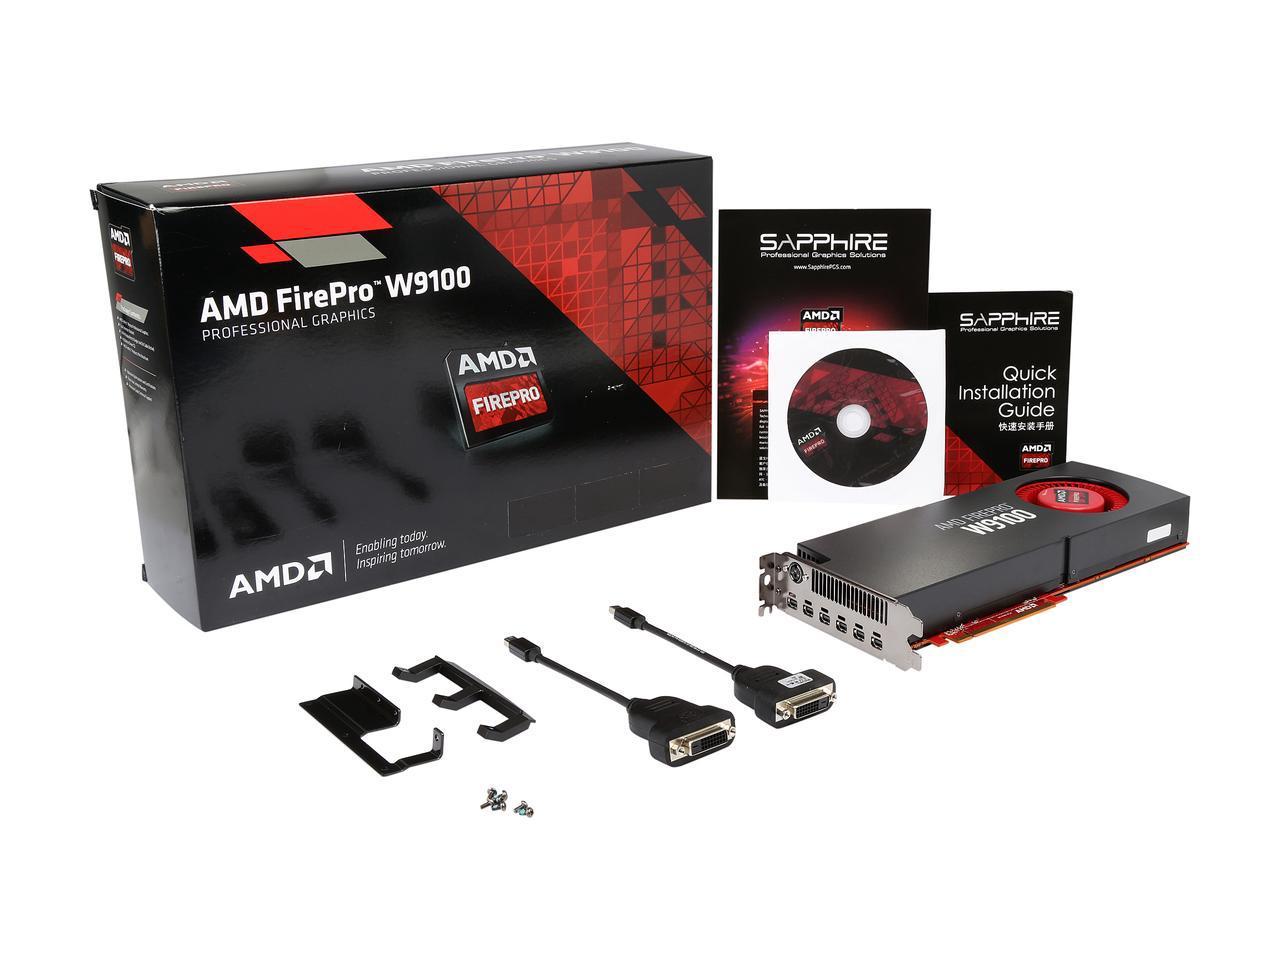 AMD FirePro W9100 - 32GB GDDR5 6-mDP PCIe 3.0